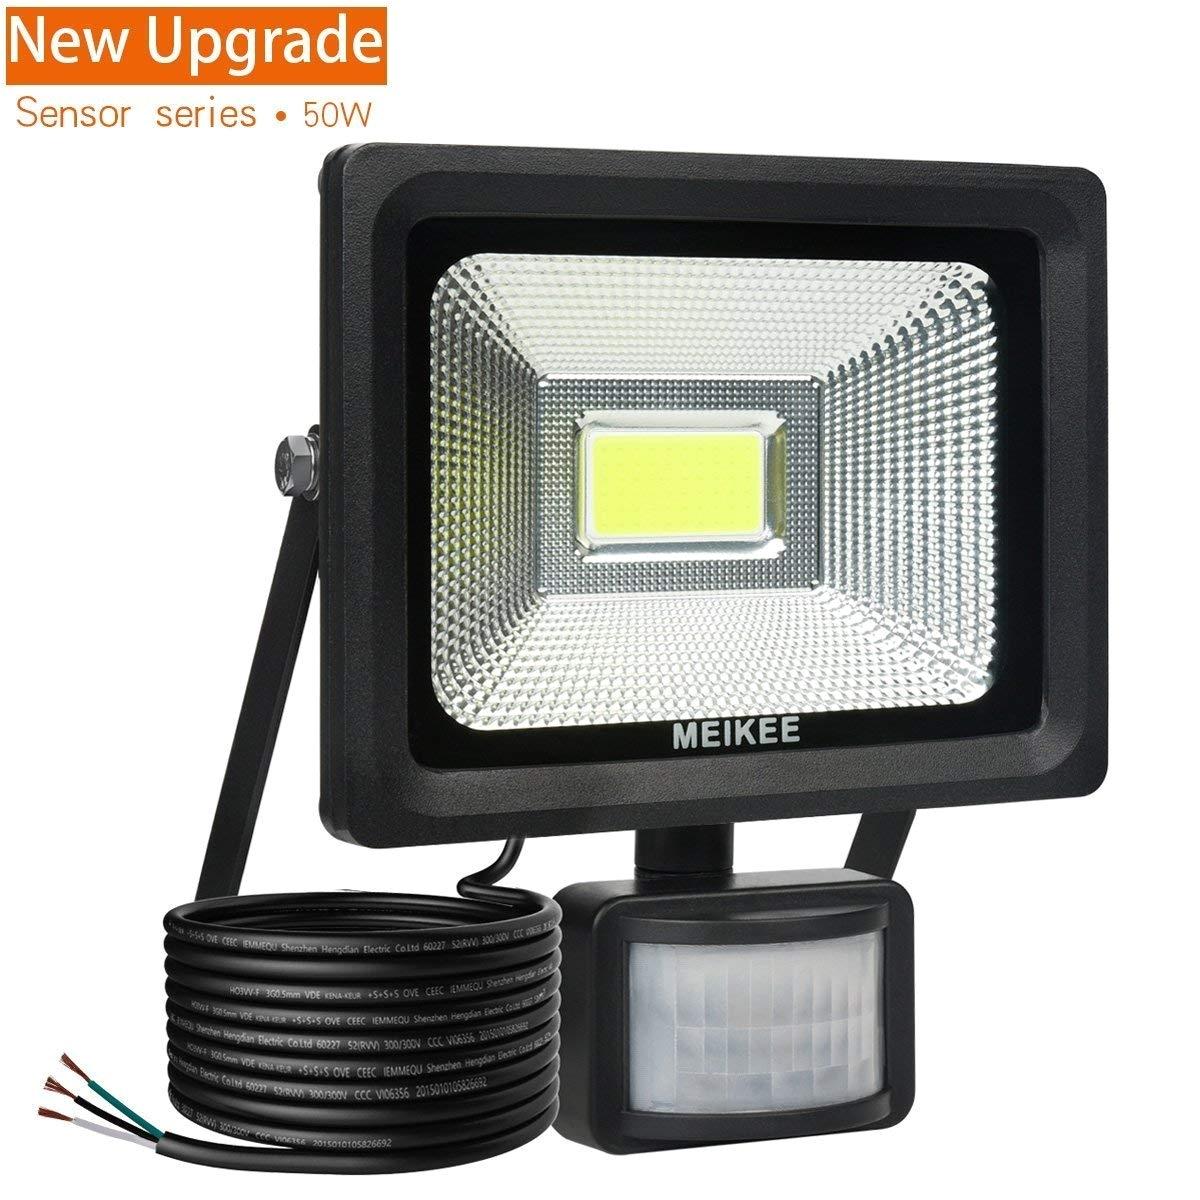 motion sensor flood light meikee 50w super bright led flood lights high output 3750 lumen 150w hps bulb equivalent daylight white waterproof